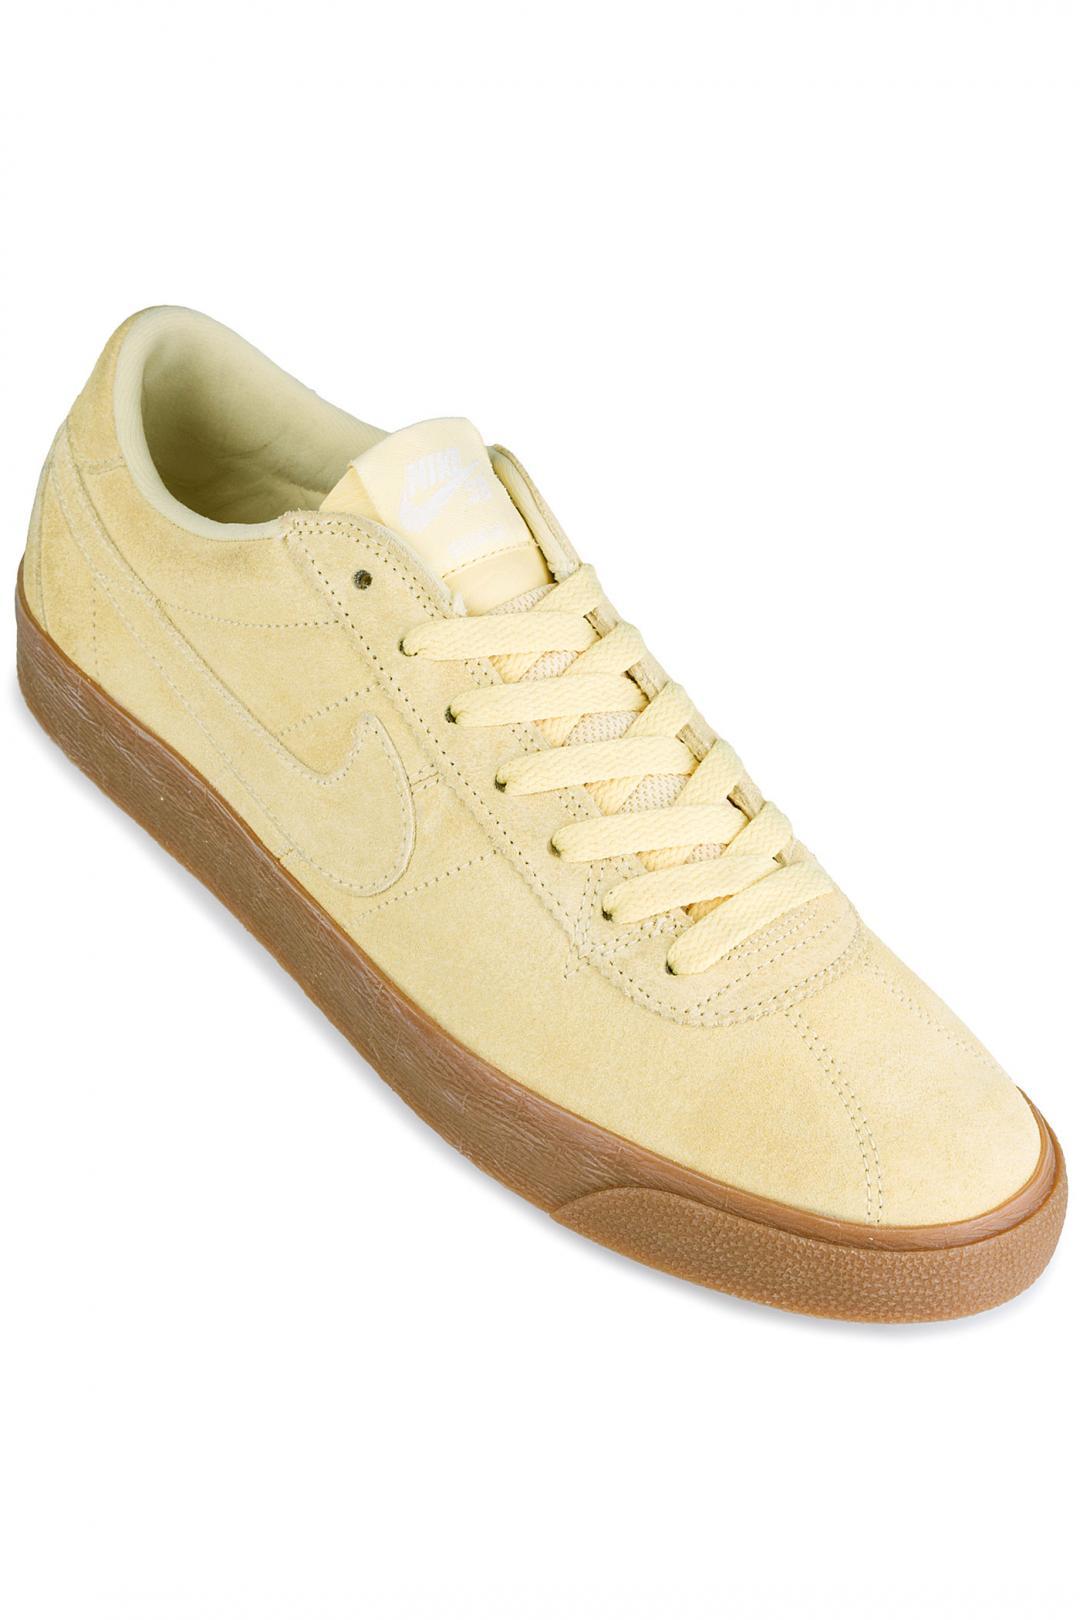 Uomo Nike SB Zoom Bruin lemon wash gum | Sneaker